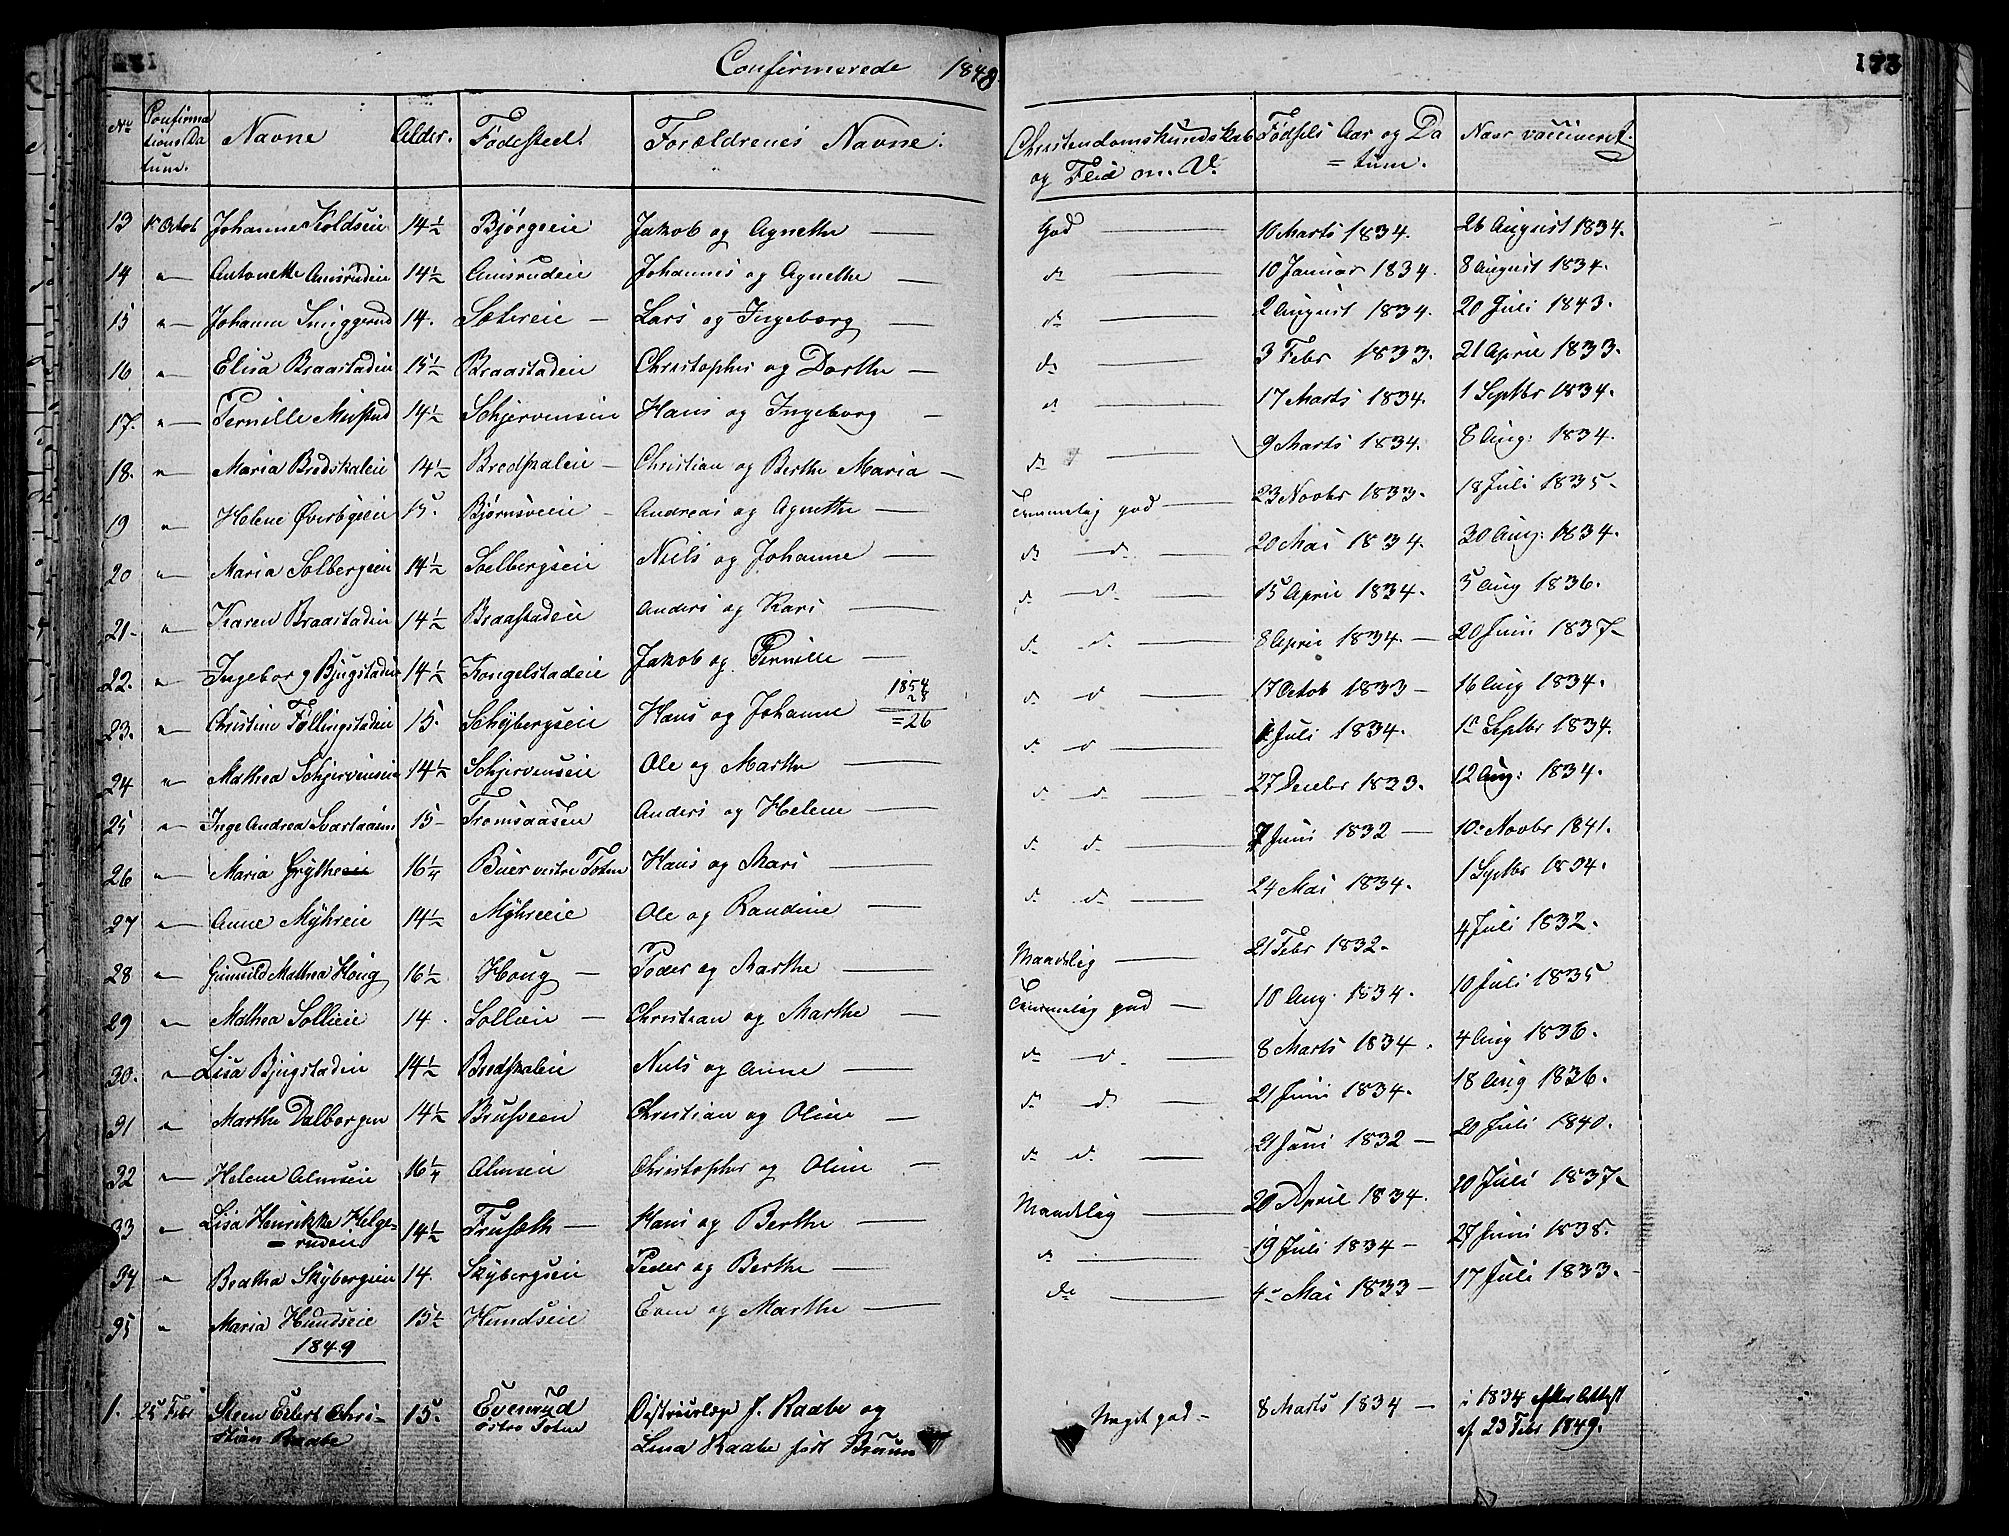 SAH, Vardal prestekontor, H/Ha/Hab/L0004: Klokkerbok nr. 4, 1831-1853, s. 173